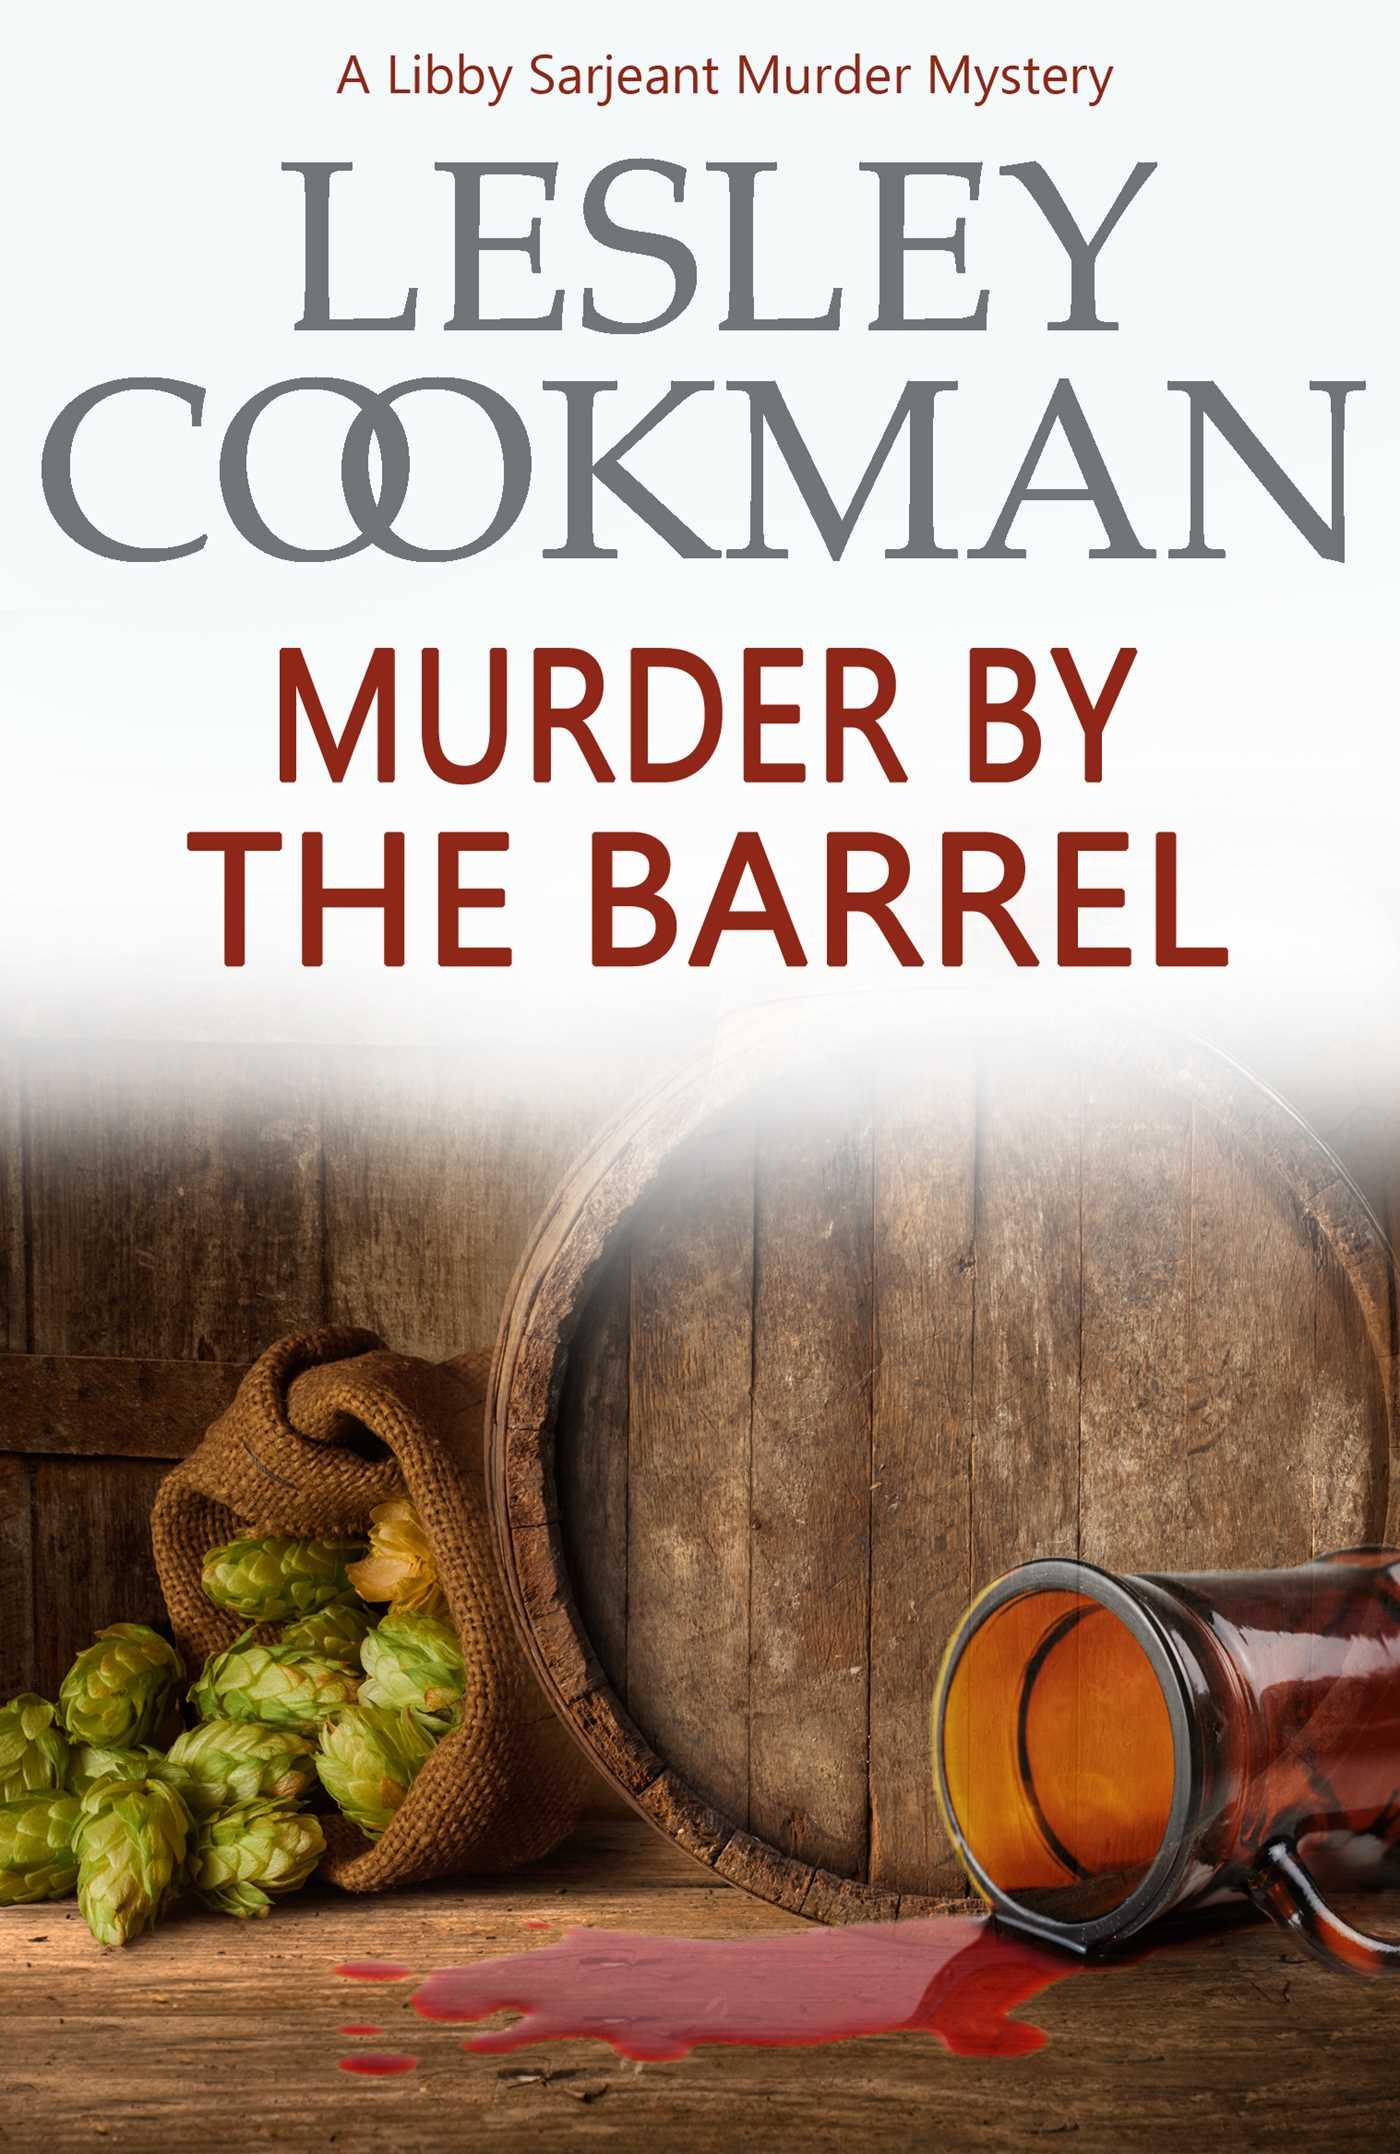 Murder by the barrel 9781635969986 hr